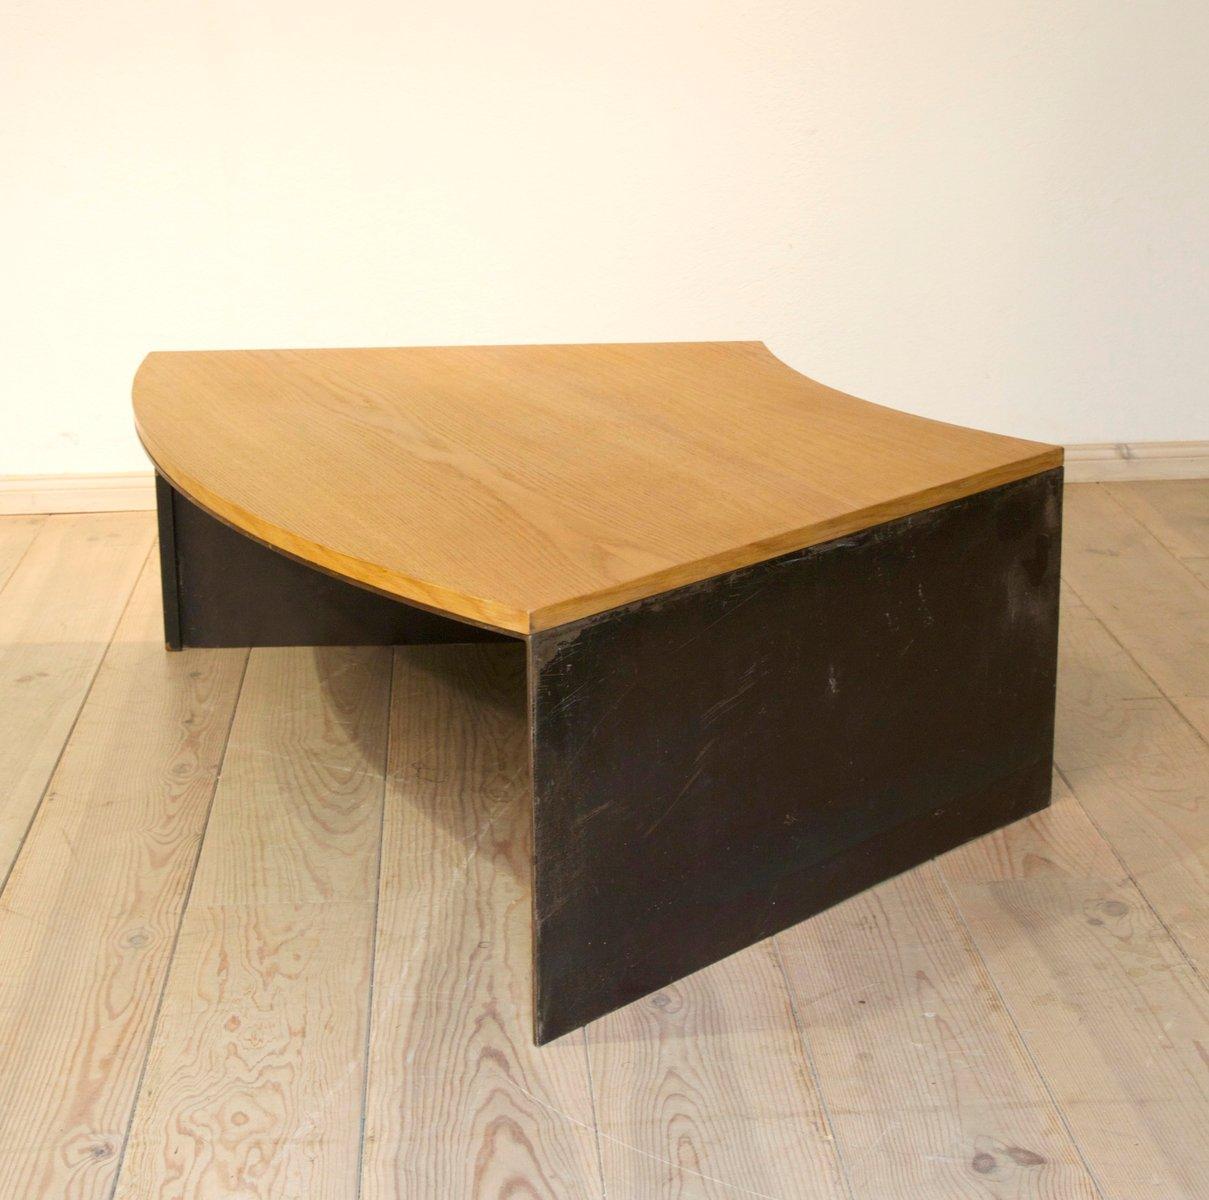 table basse vintage en m tal et en ch ne en vente sur pamono. Black Bedroom Furniture Sets. Home Design Ideas